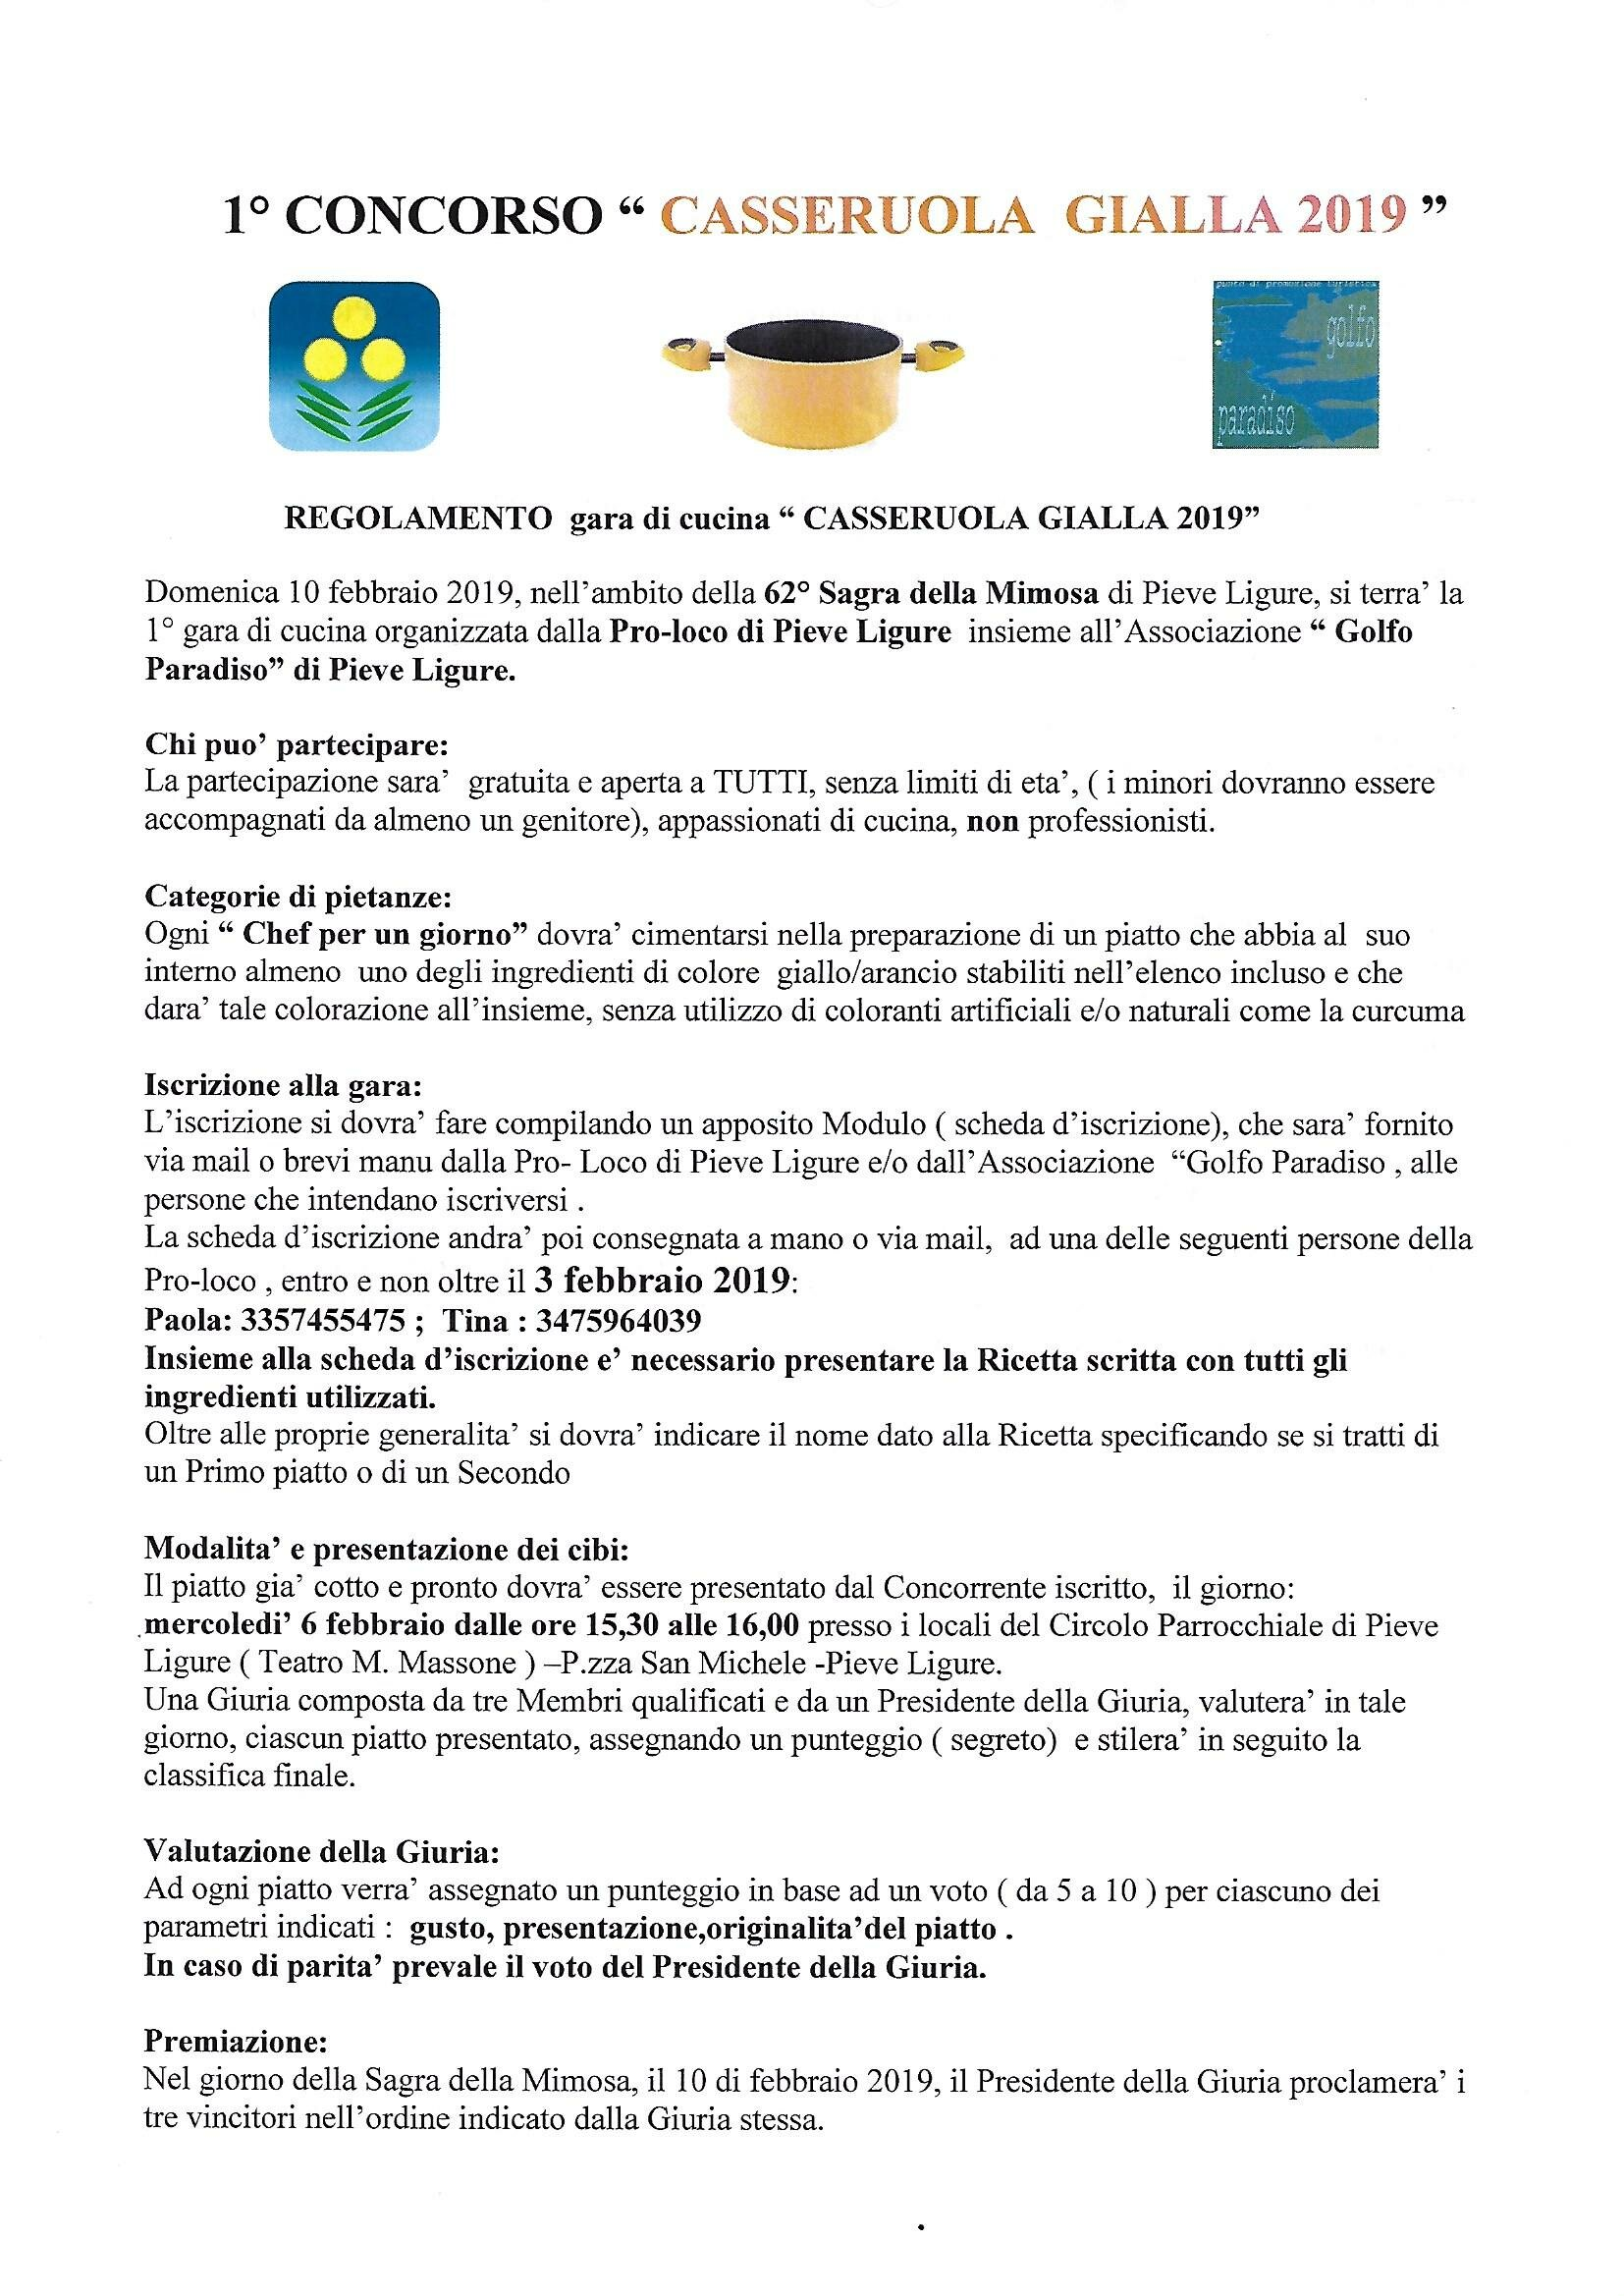 Regolamento Casseruola gialla 2019- pag.1